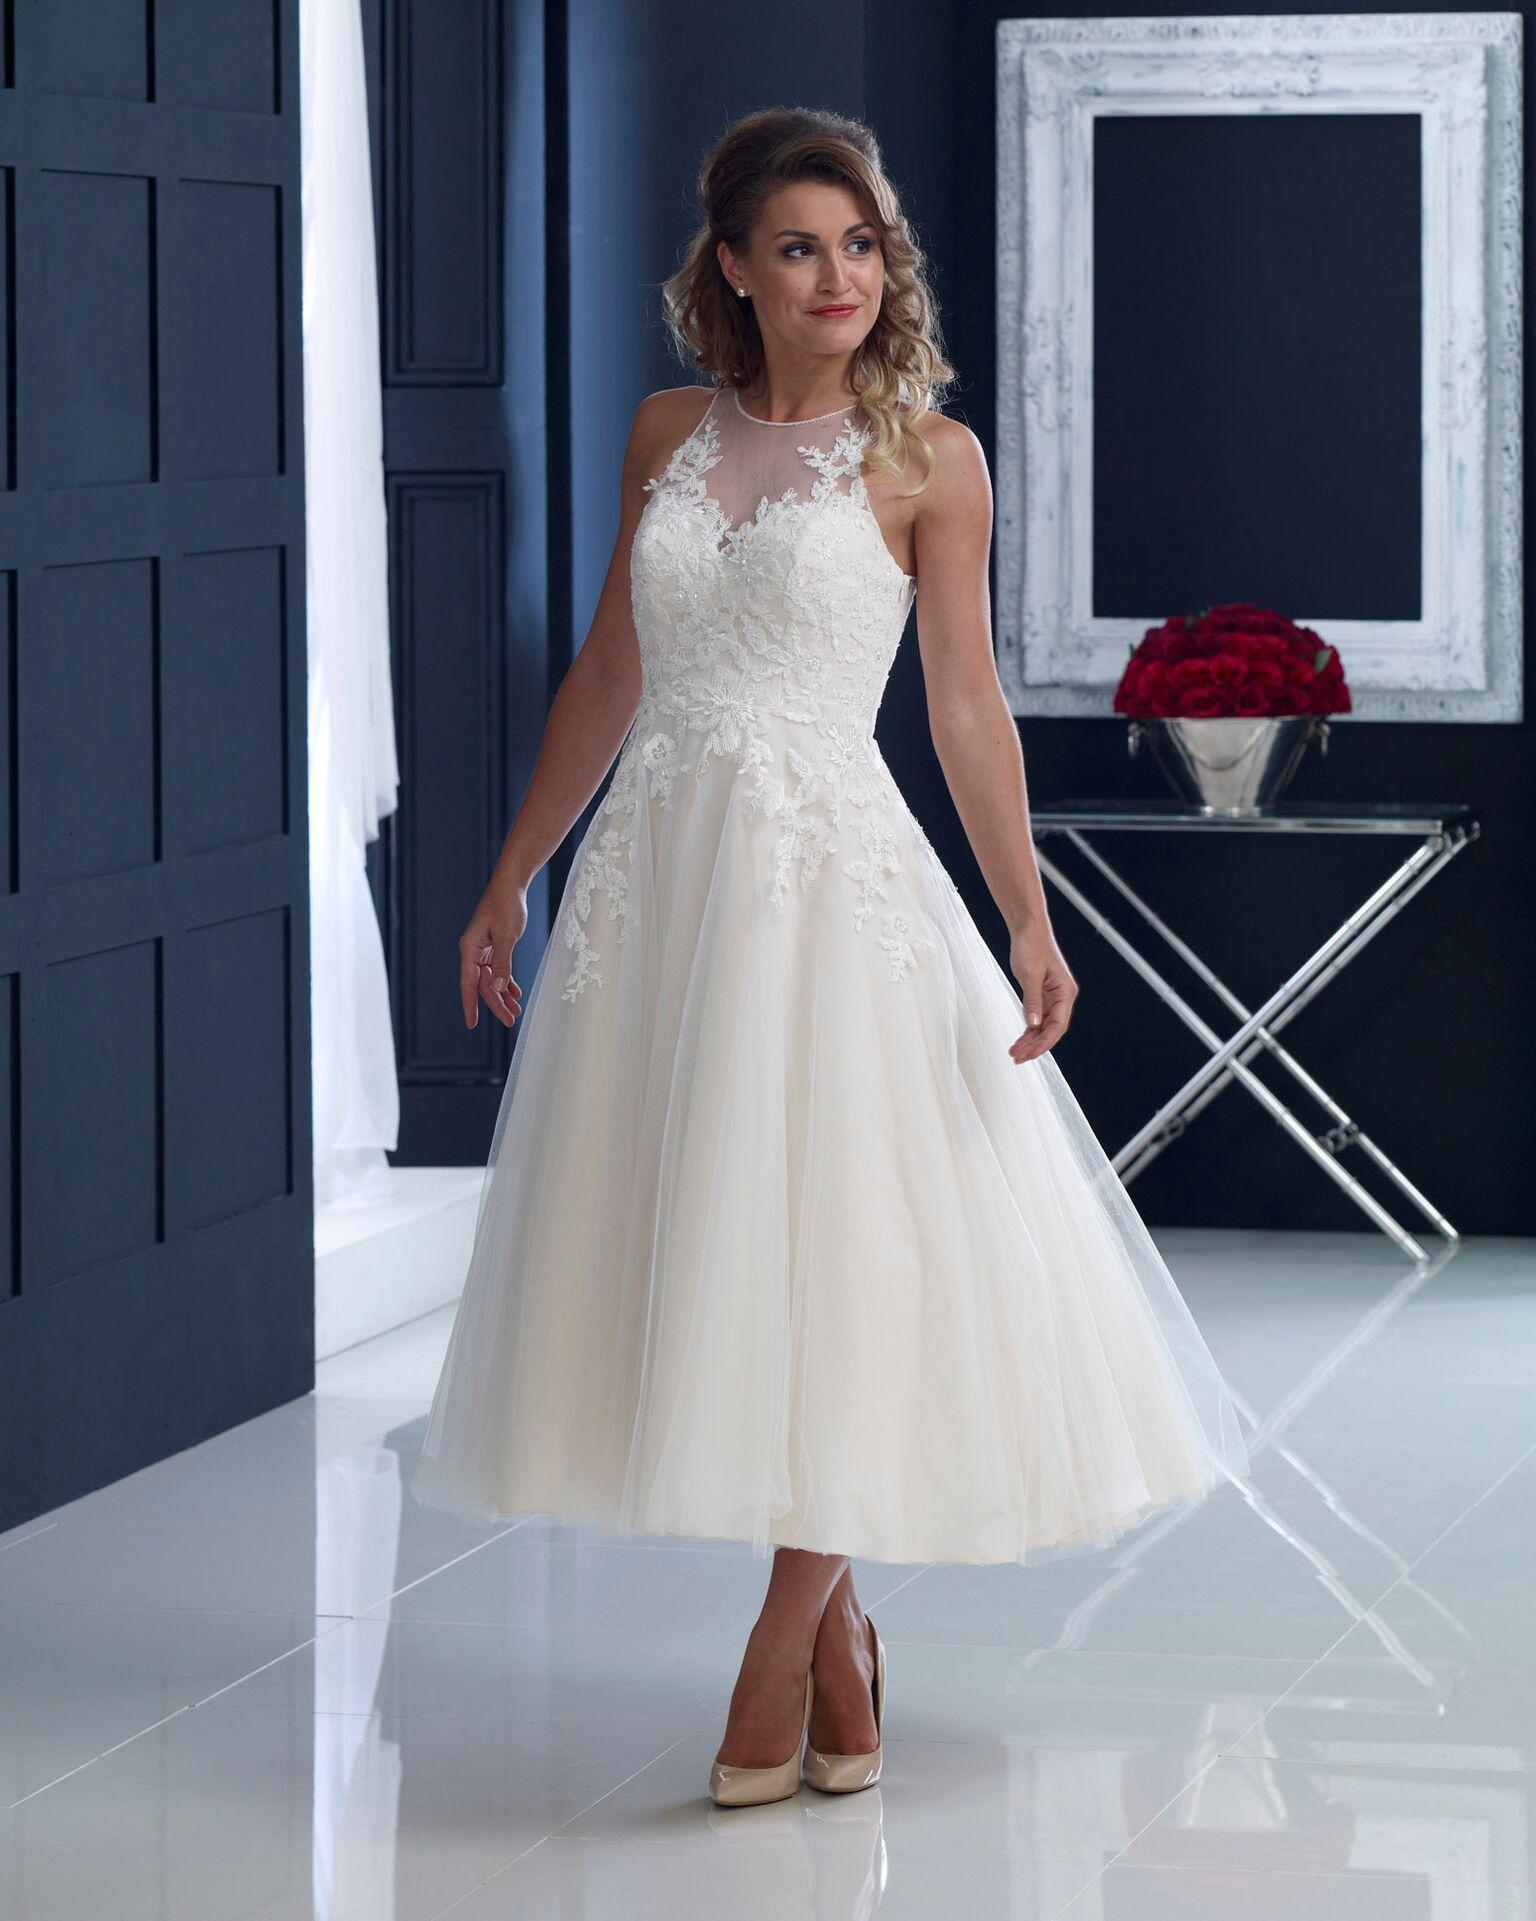 Fifties style wedding dresses 2018